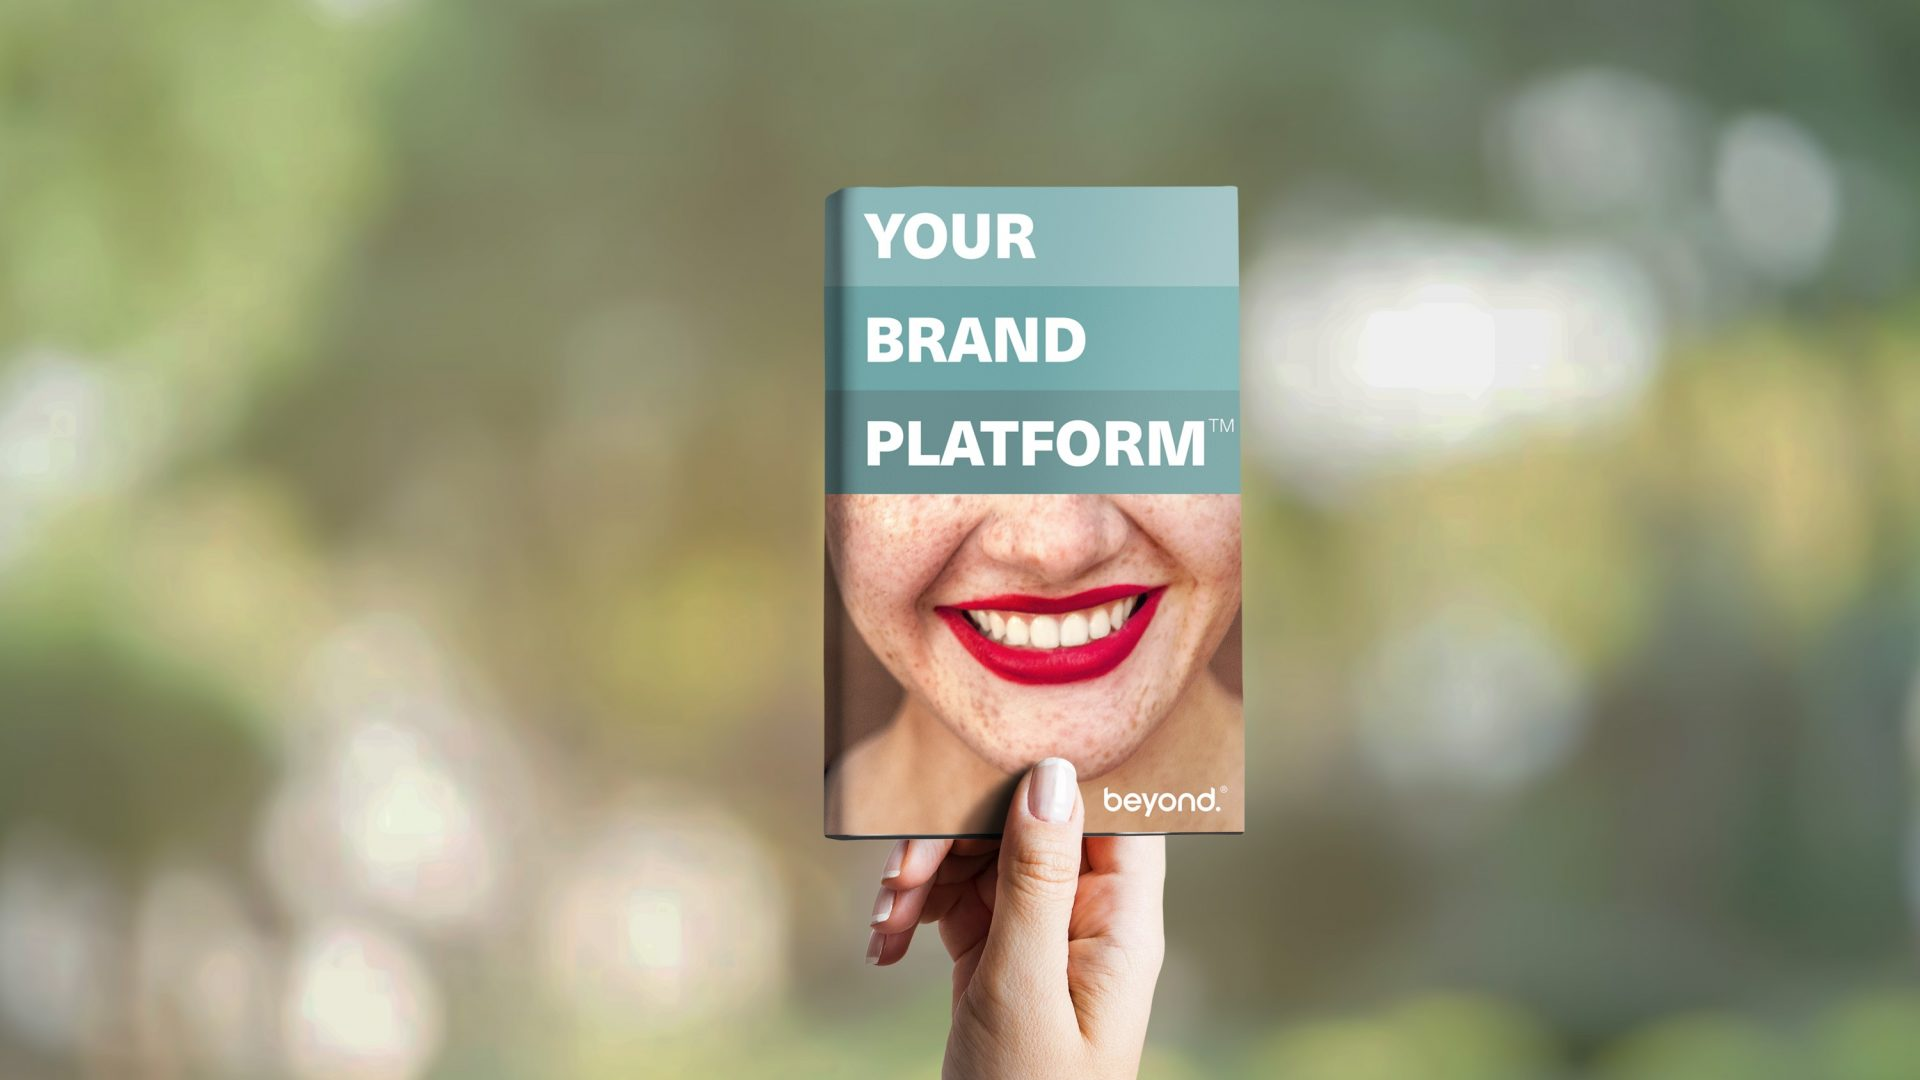 Your brand platform